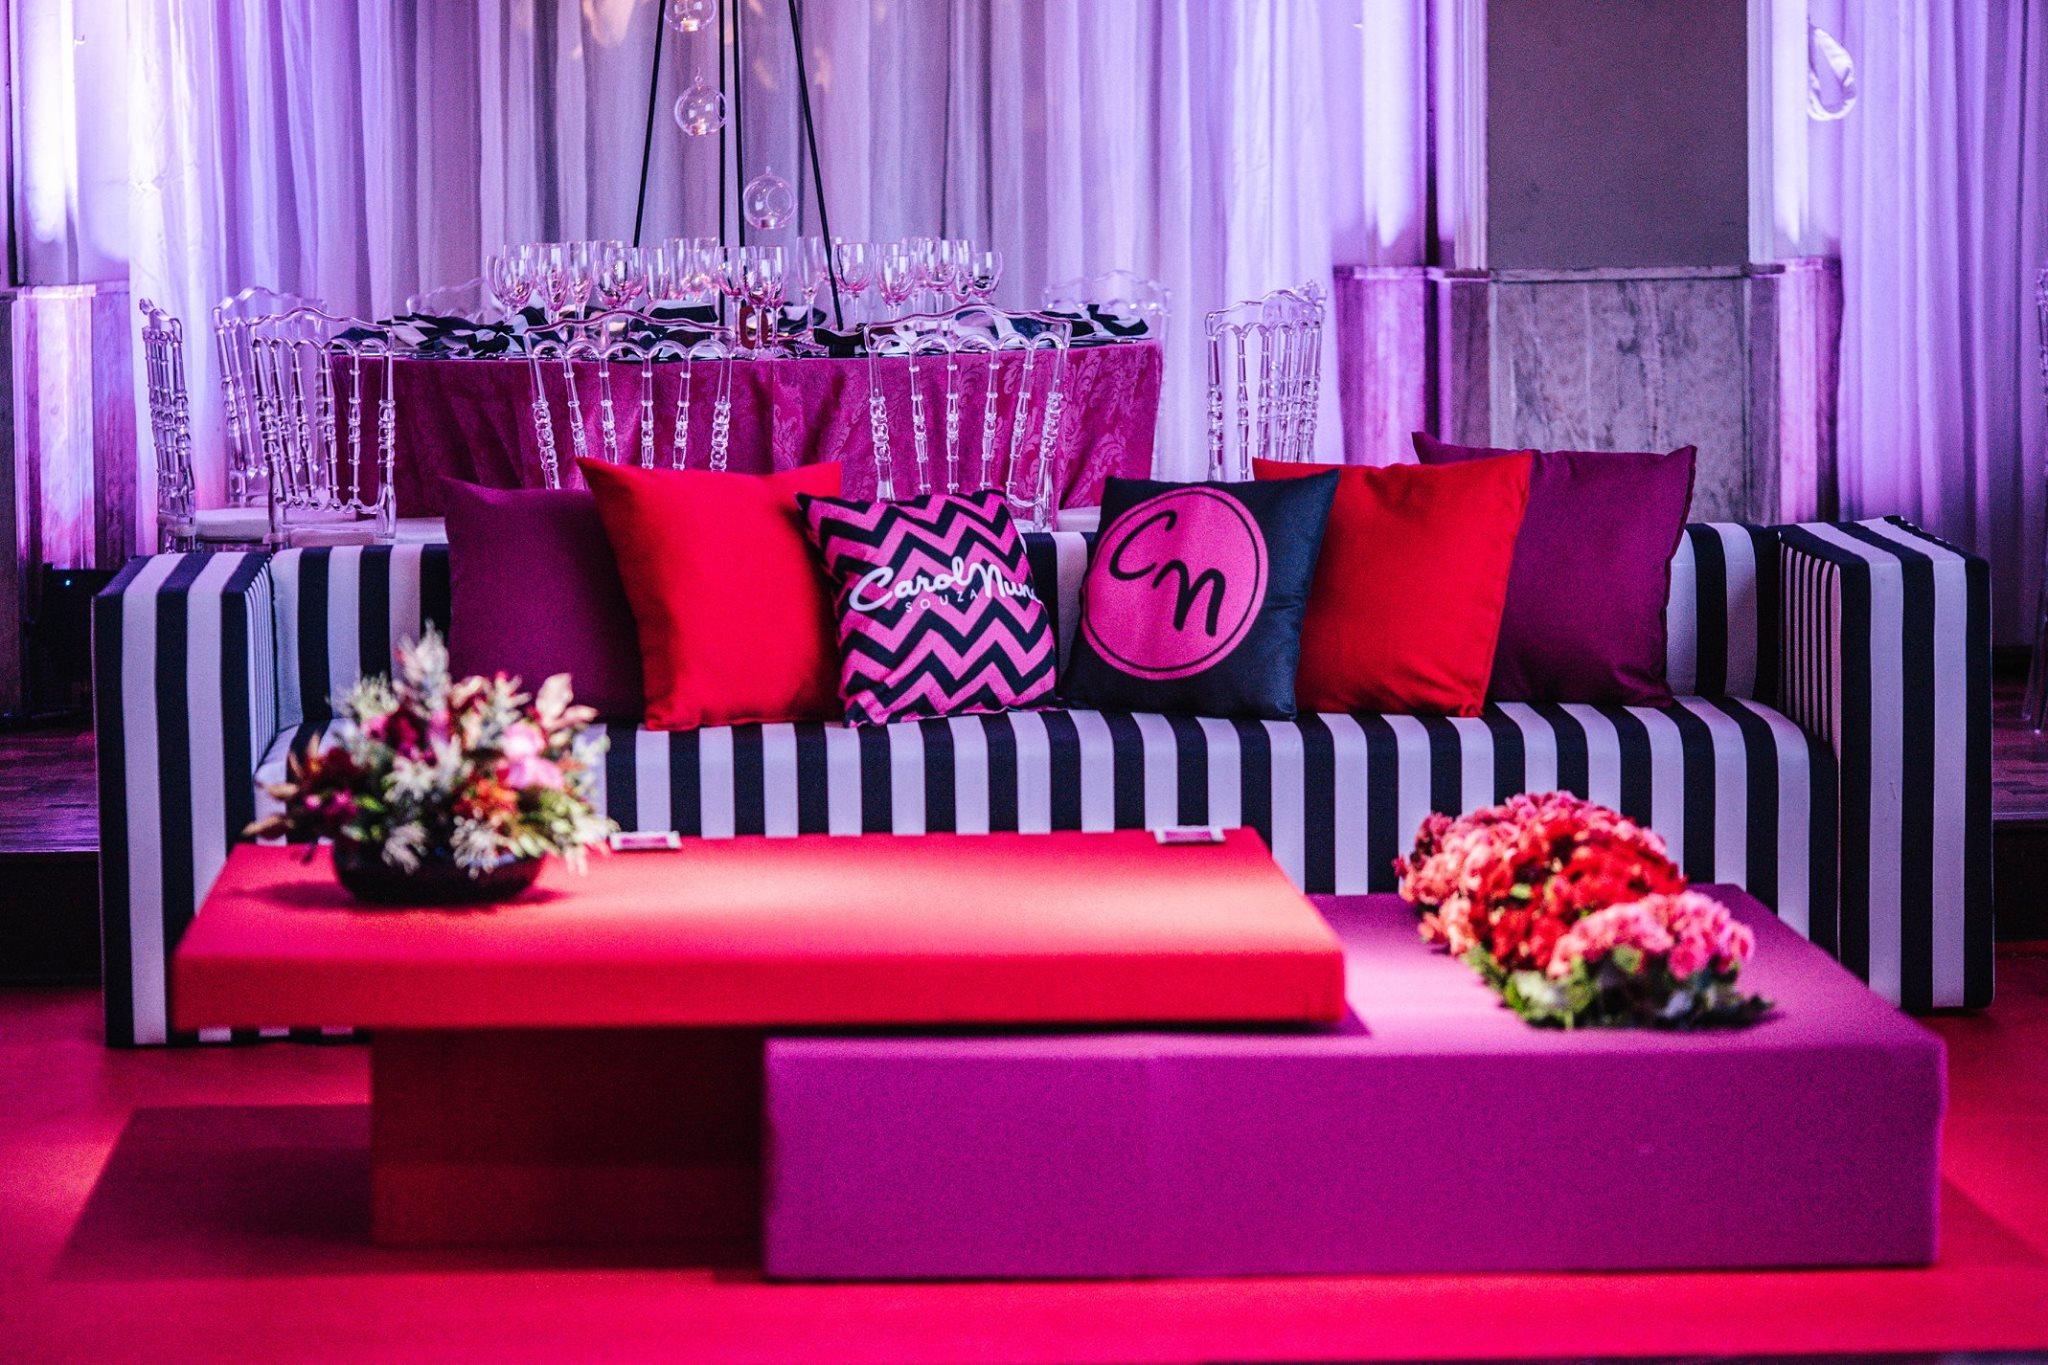 Evento, Casamento, Debut, Formatura